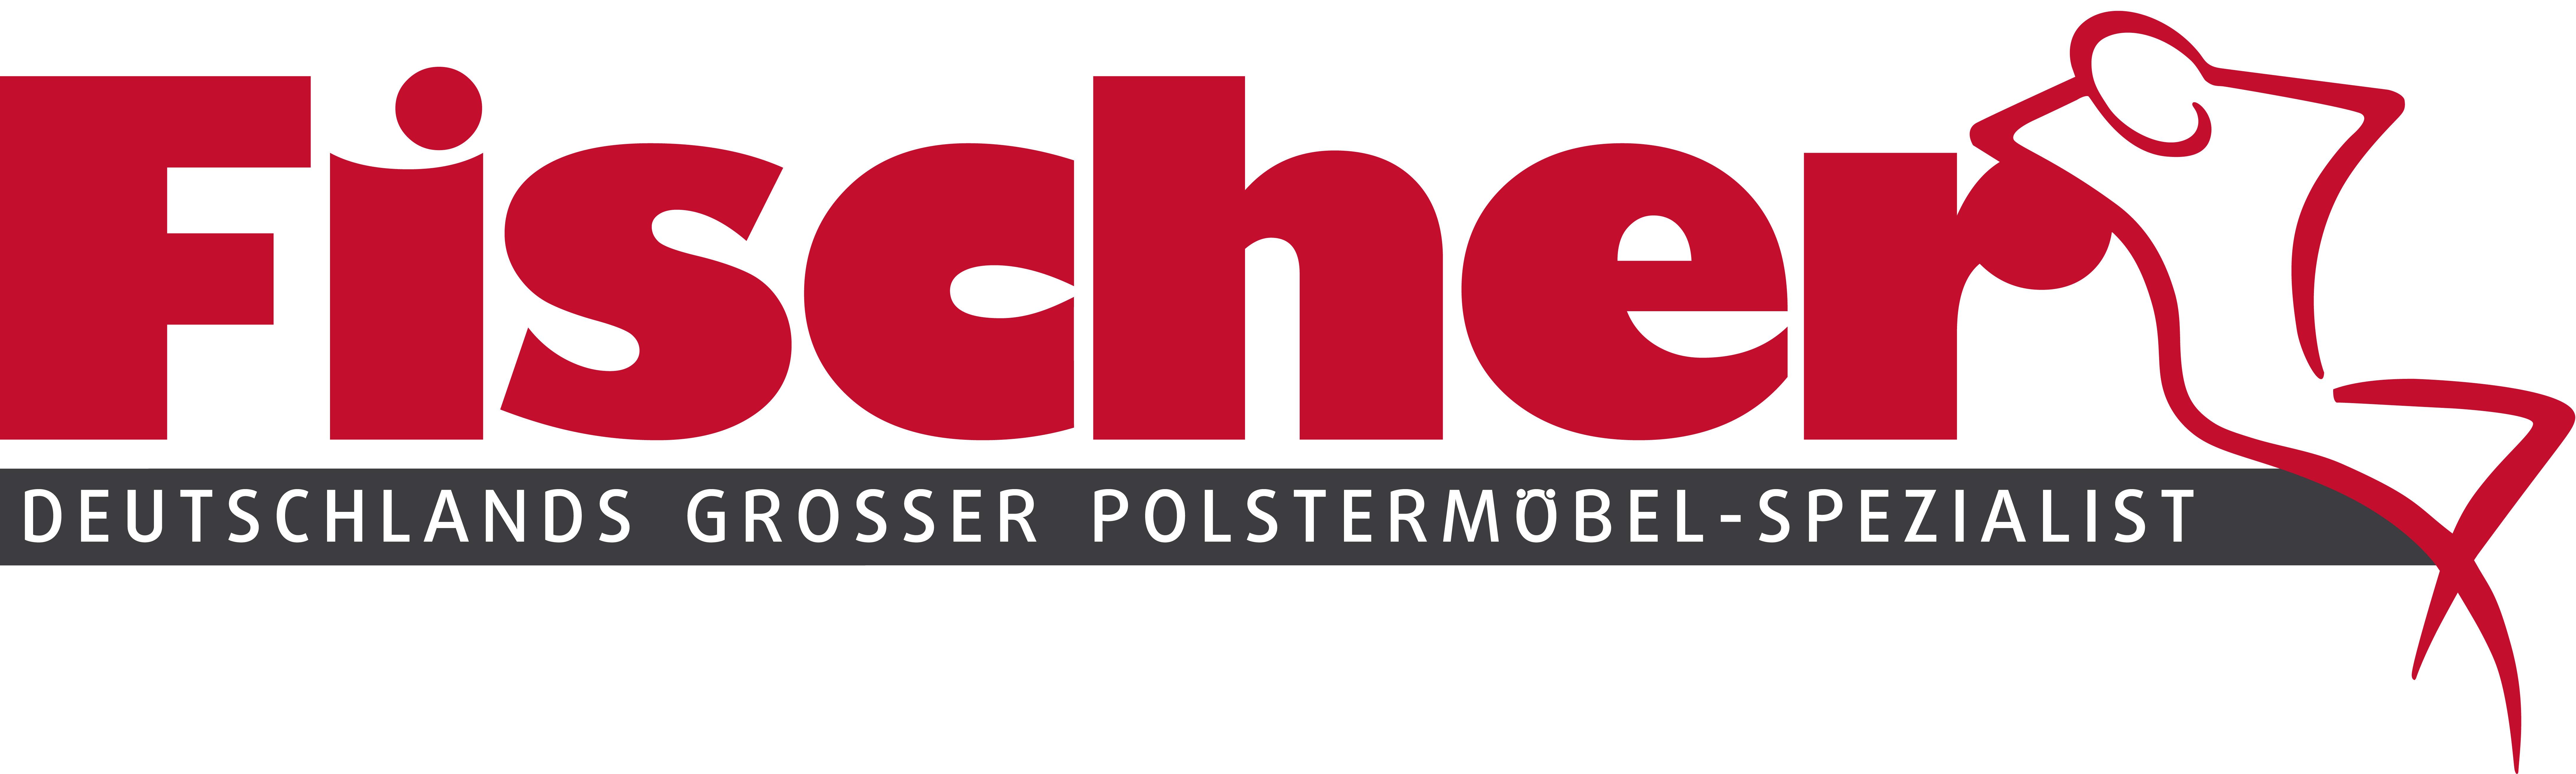 polstermoebel-fischer-max-fischer-gmbh-fellbach logo